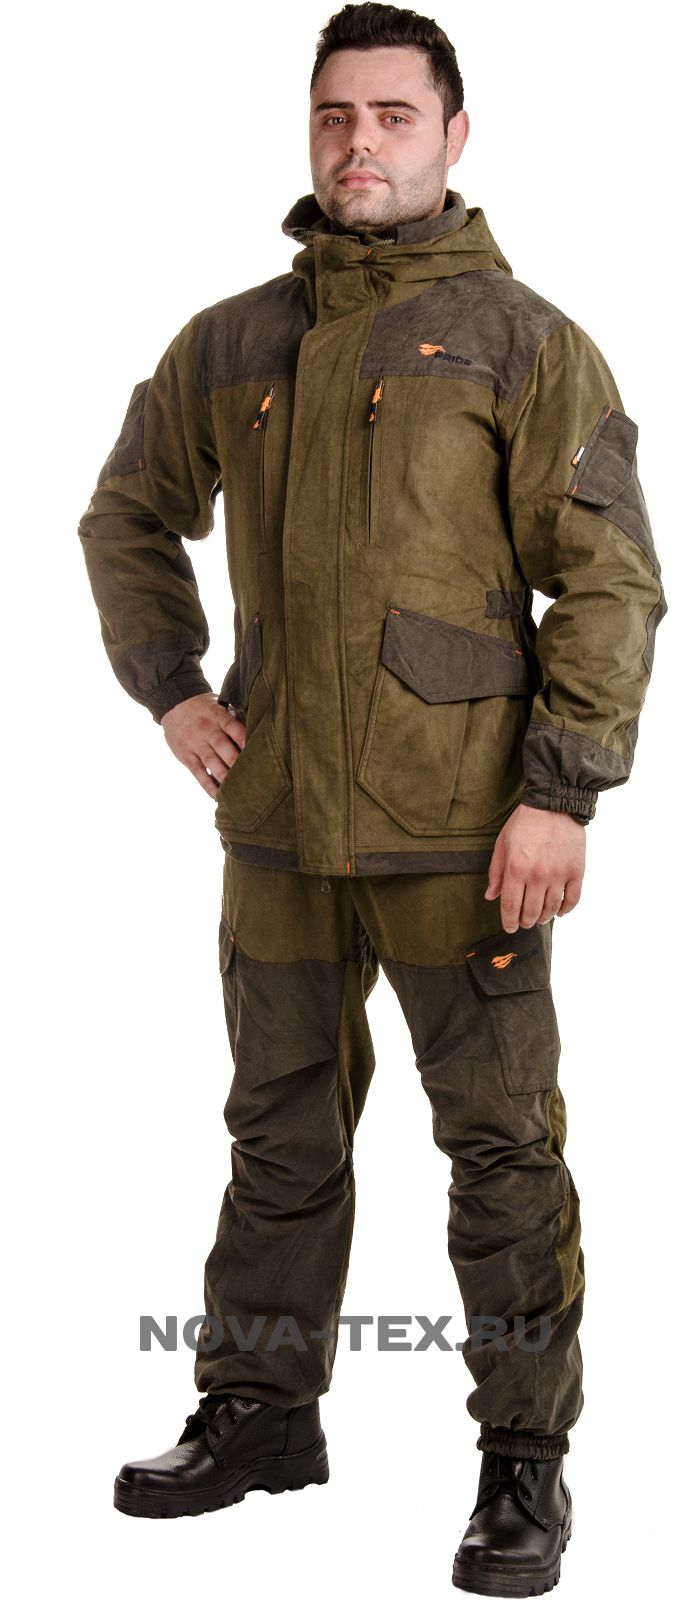 Магнум Осень костюм (финляндия, хаки) PRIDE